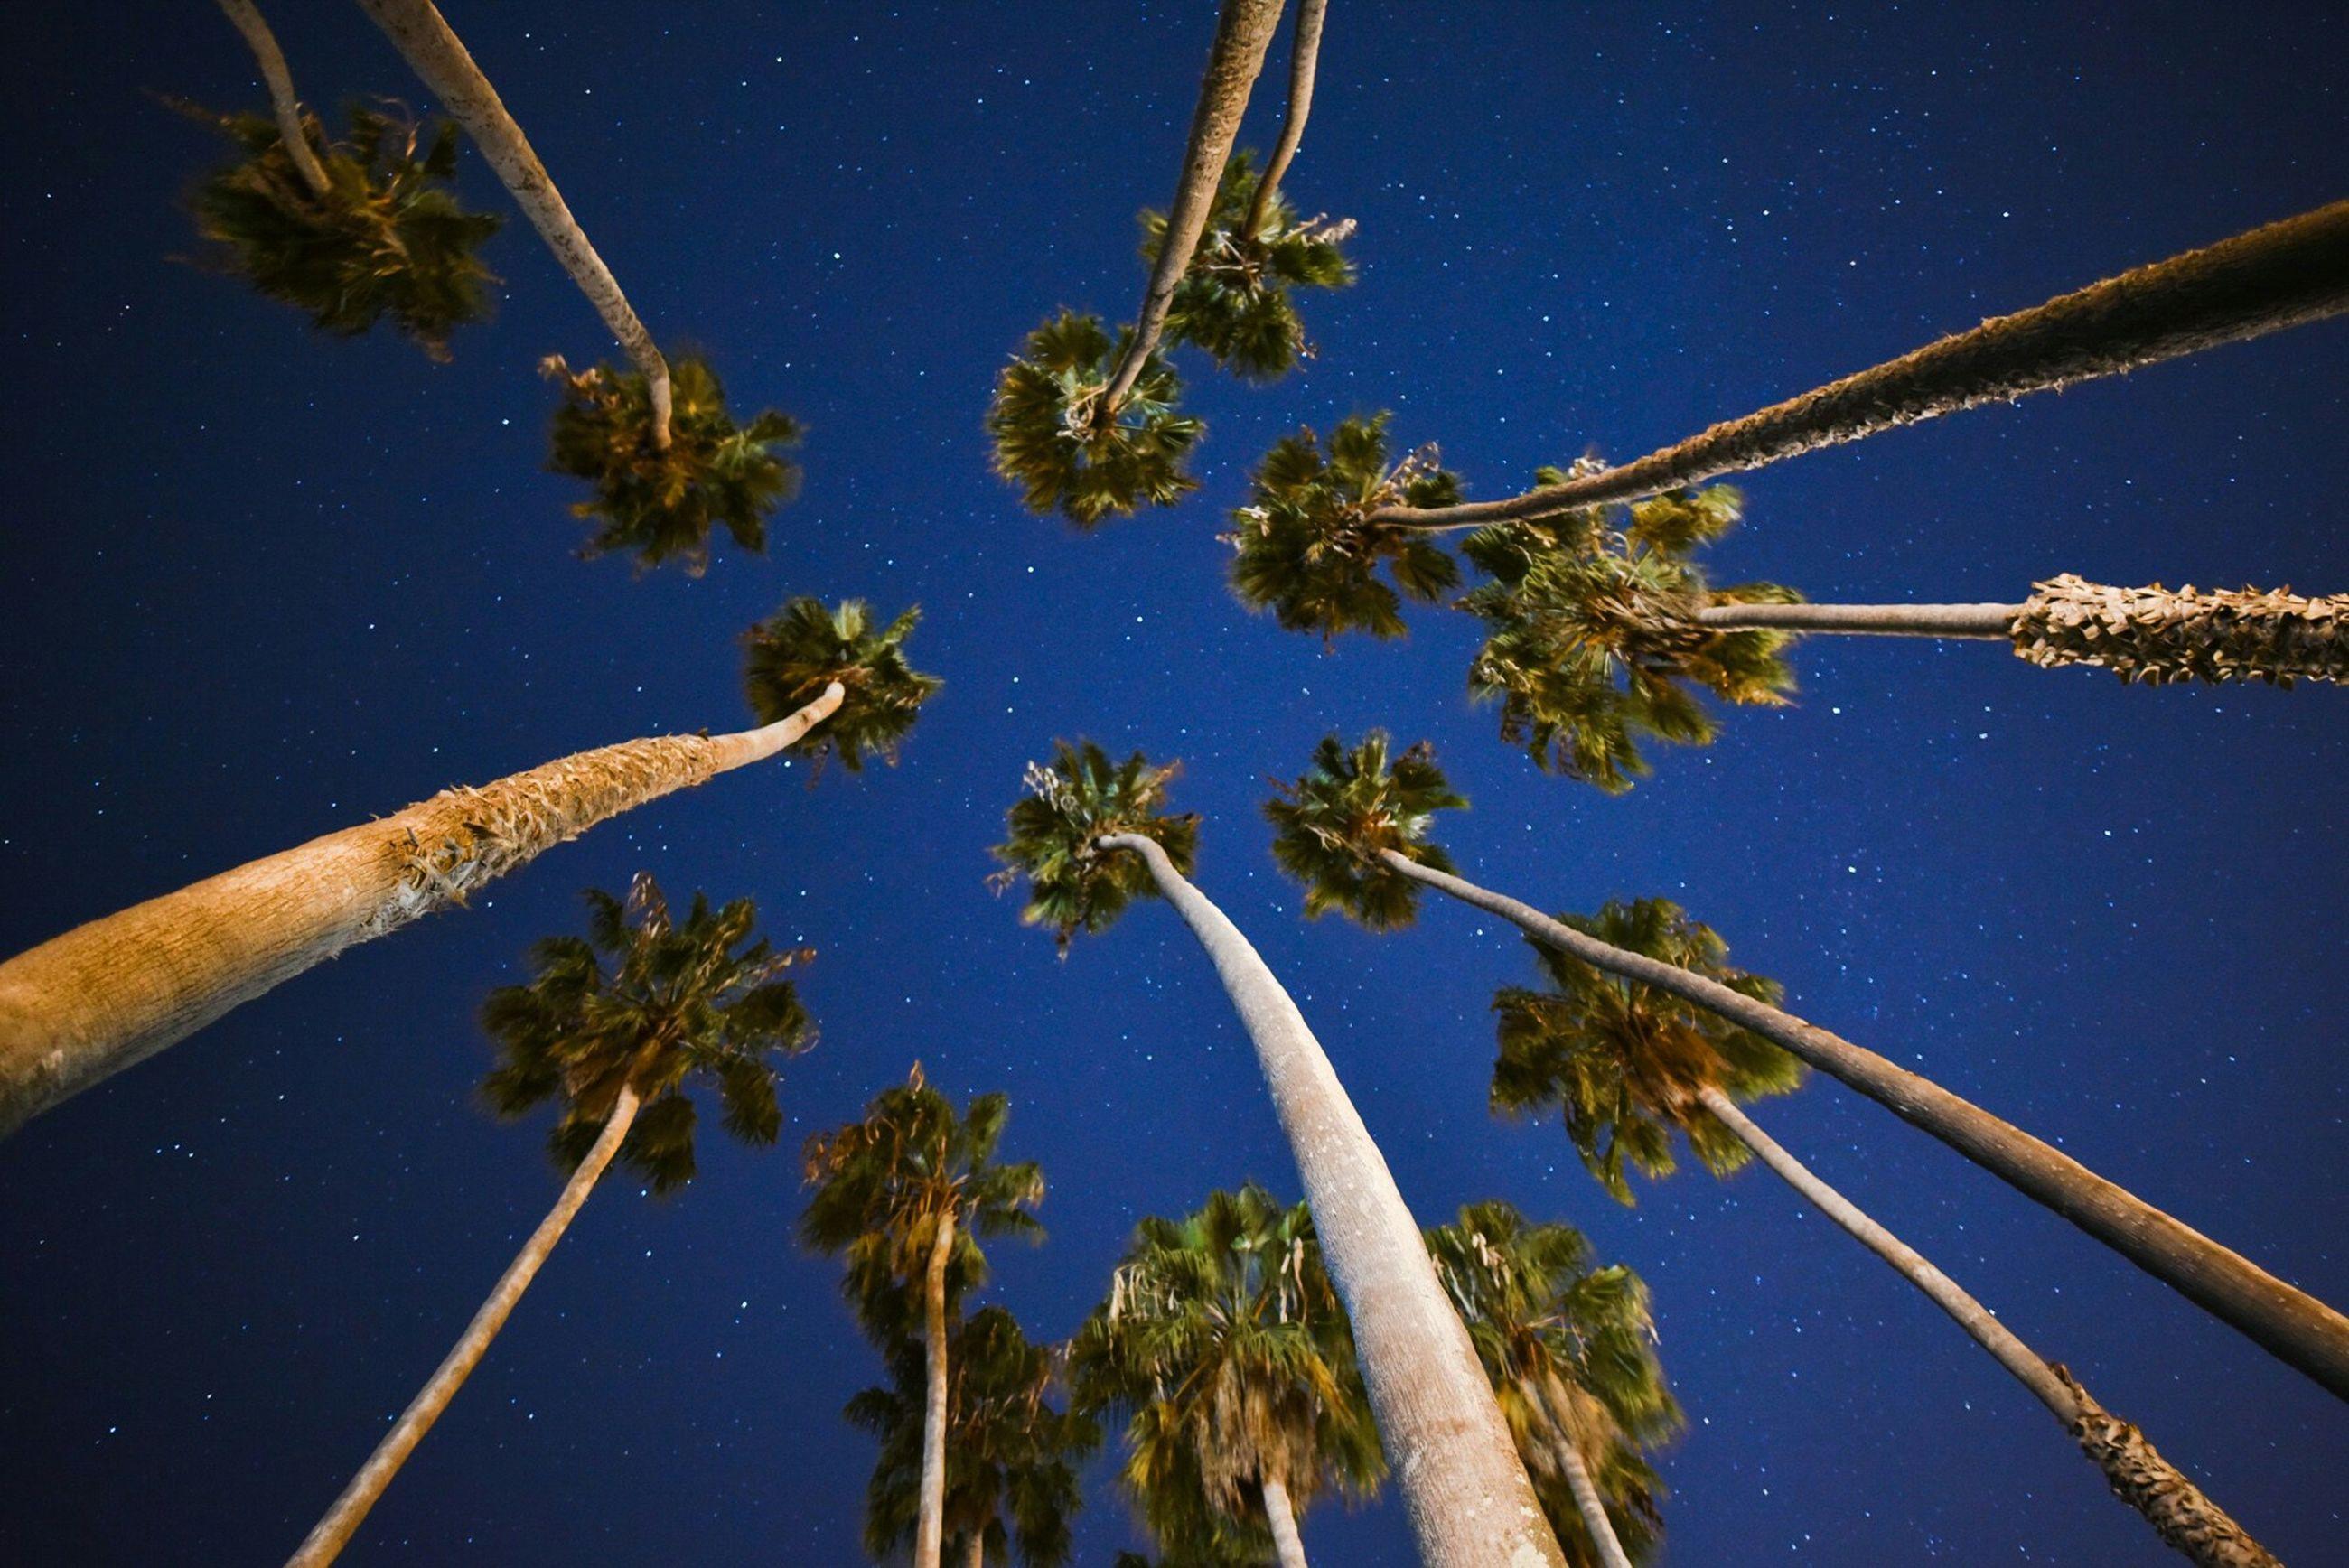 Nightphotography Night In Beach Palms Stars